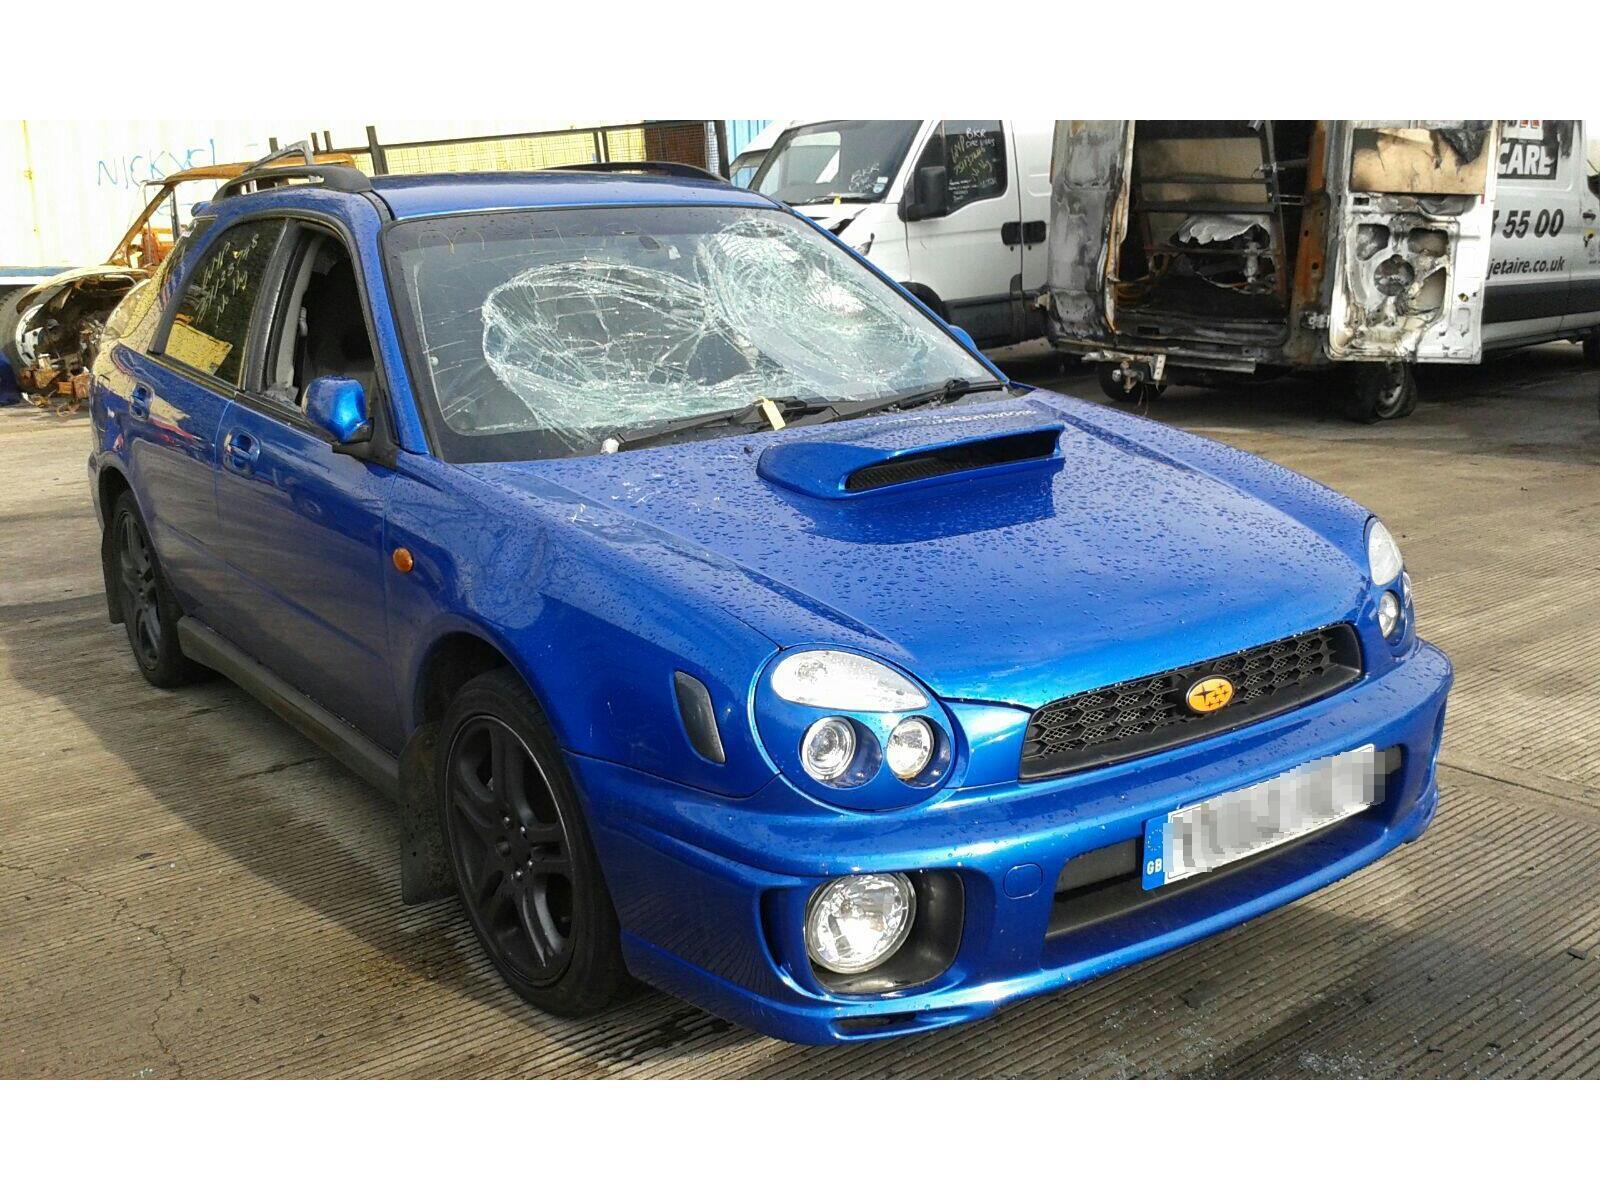 Subaru Impreza 2000 To 2003 Alternator Petrol Manual For Sale Wiring Diagram